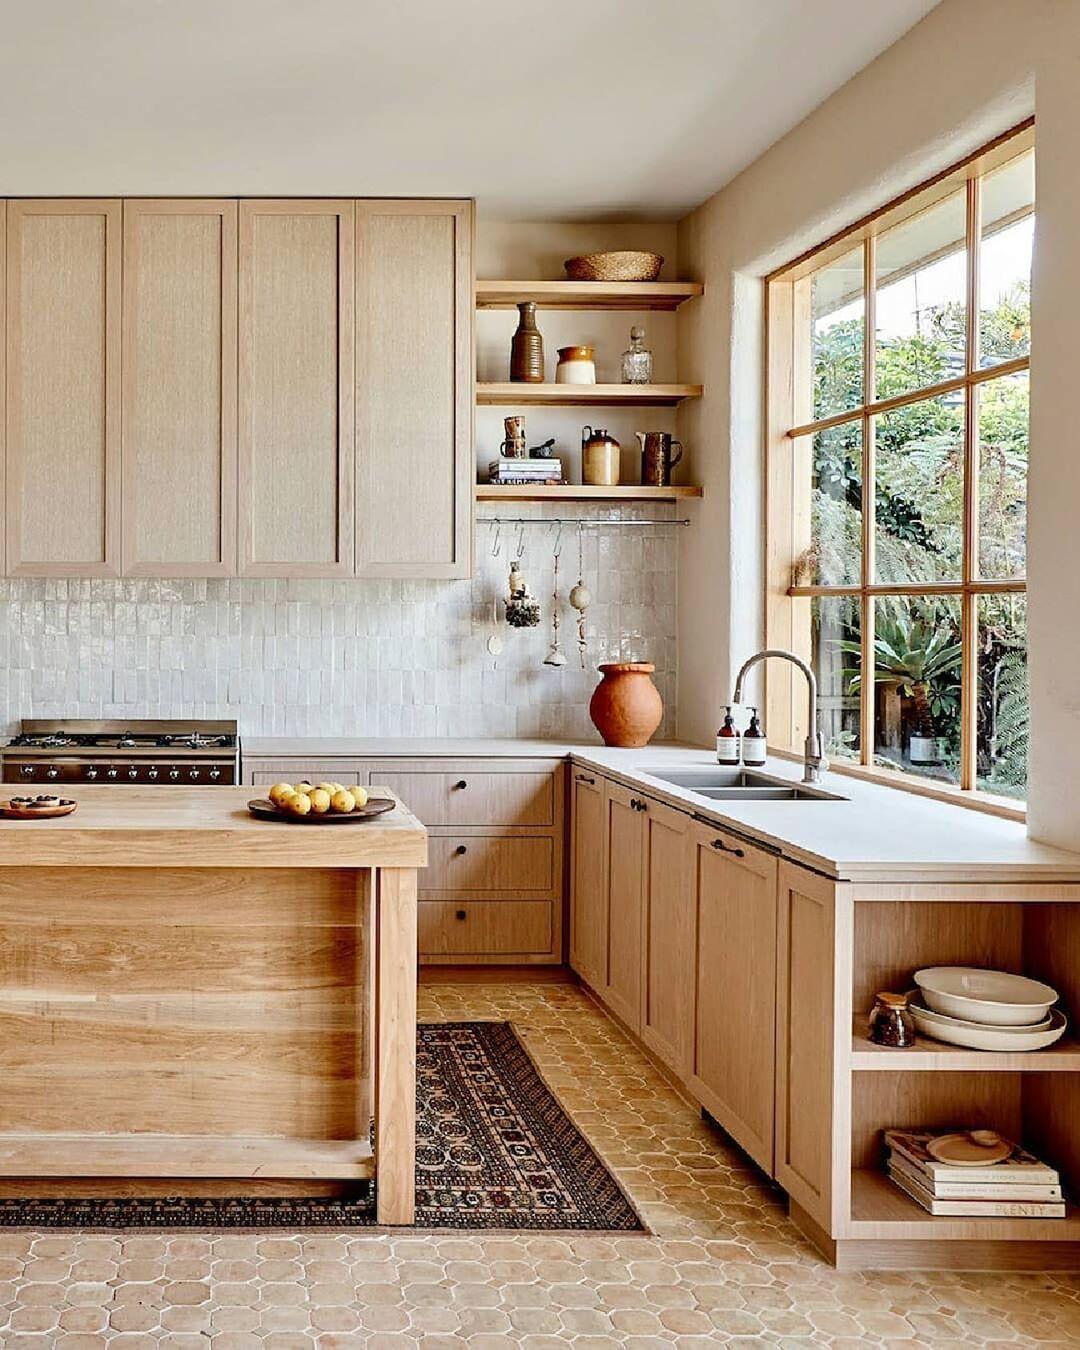 Account Temporary On Hold Scandinavian Kitchen Design Kitchen Interior Modern Kitchen Design